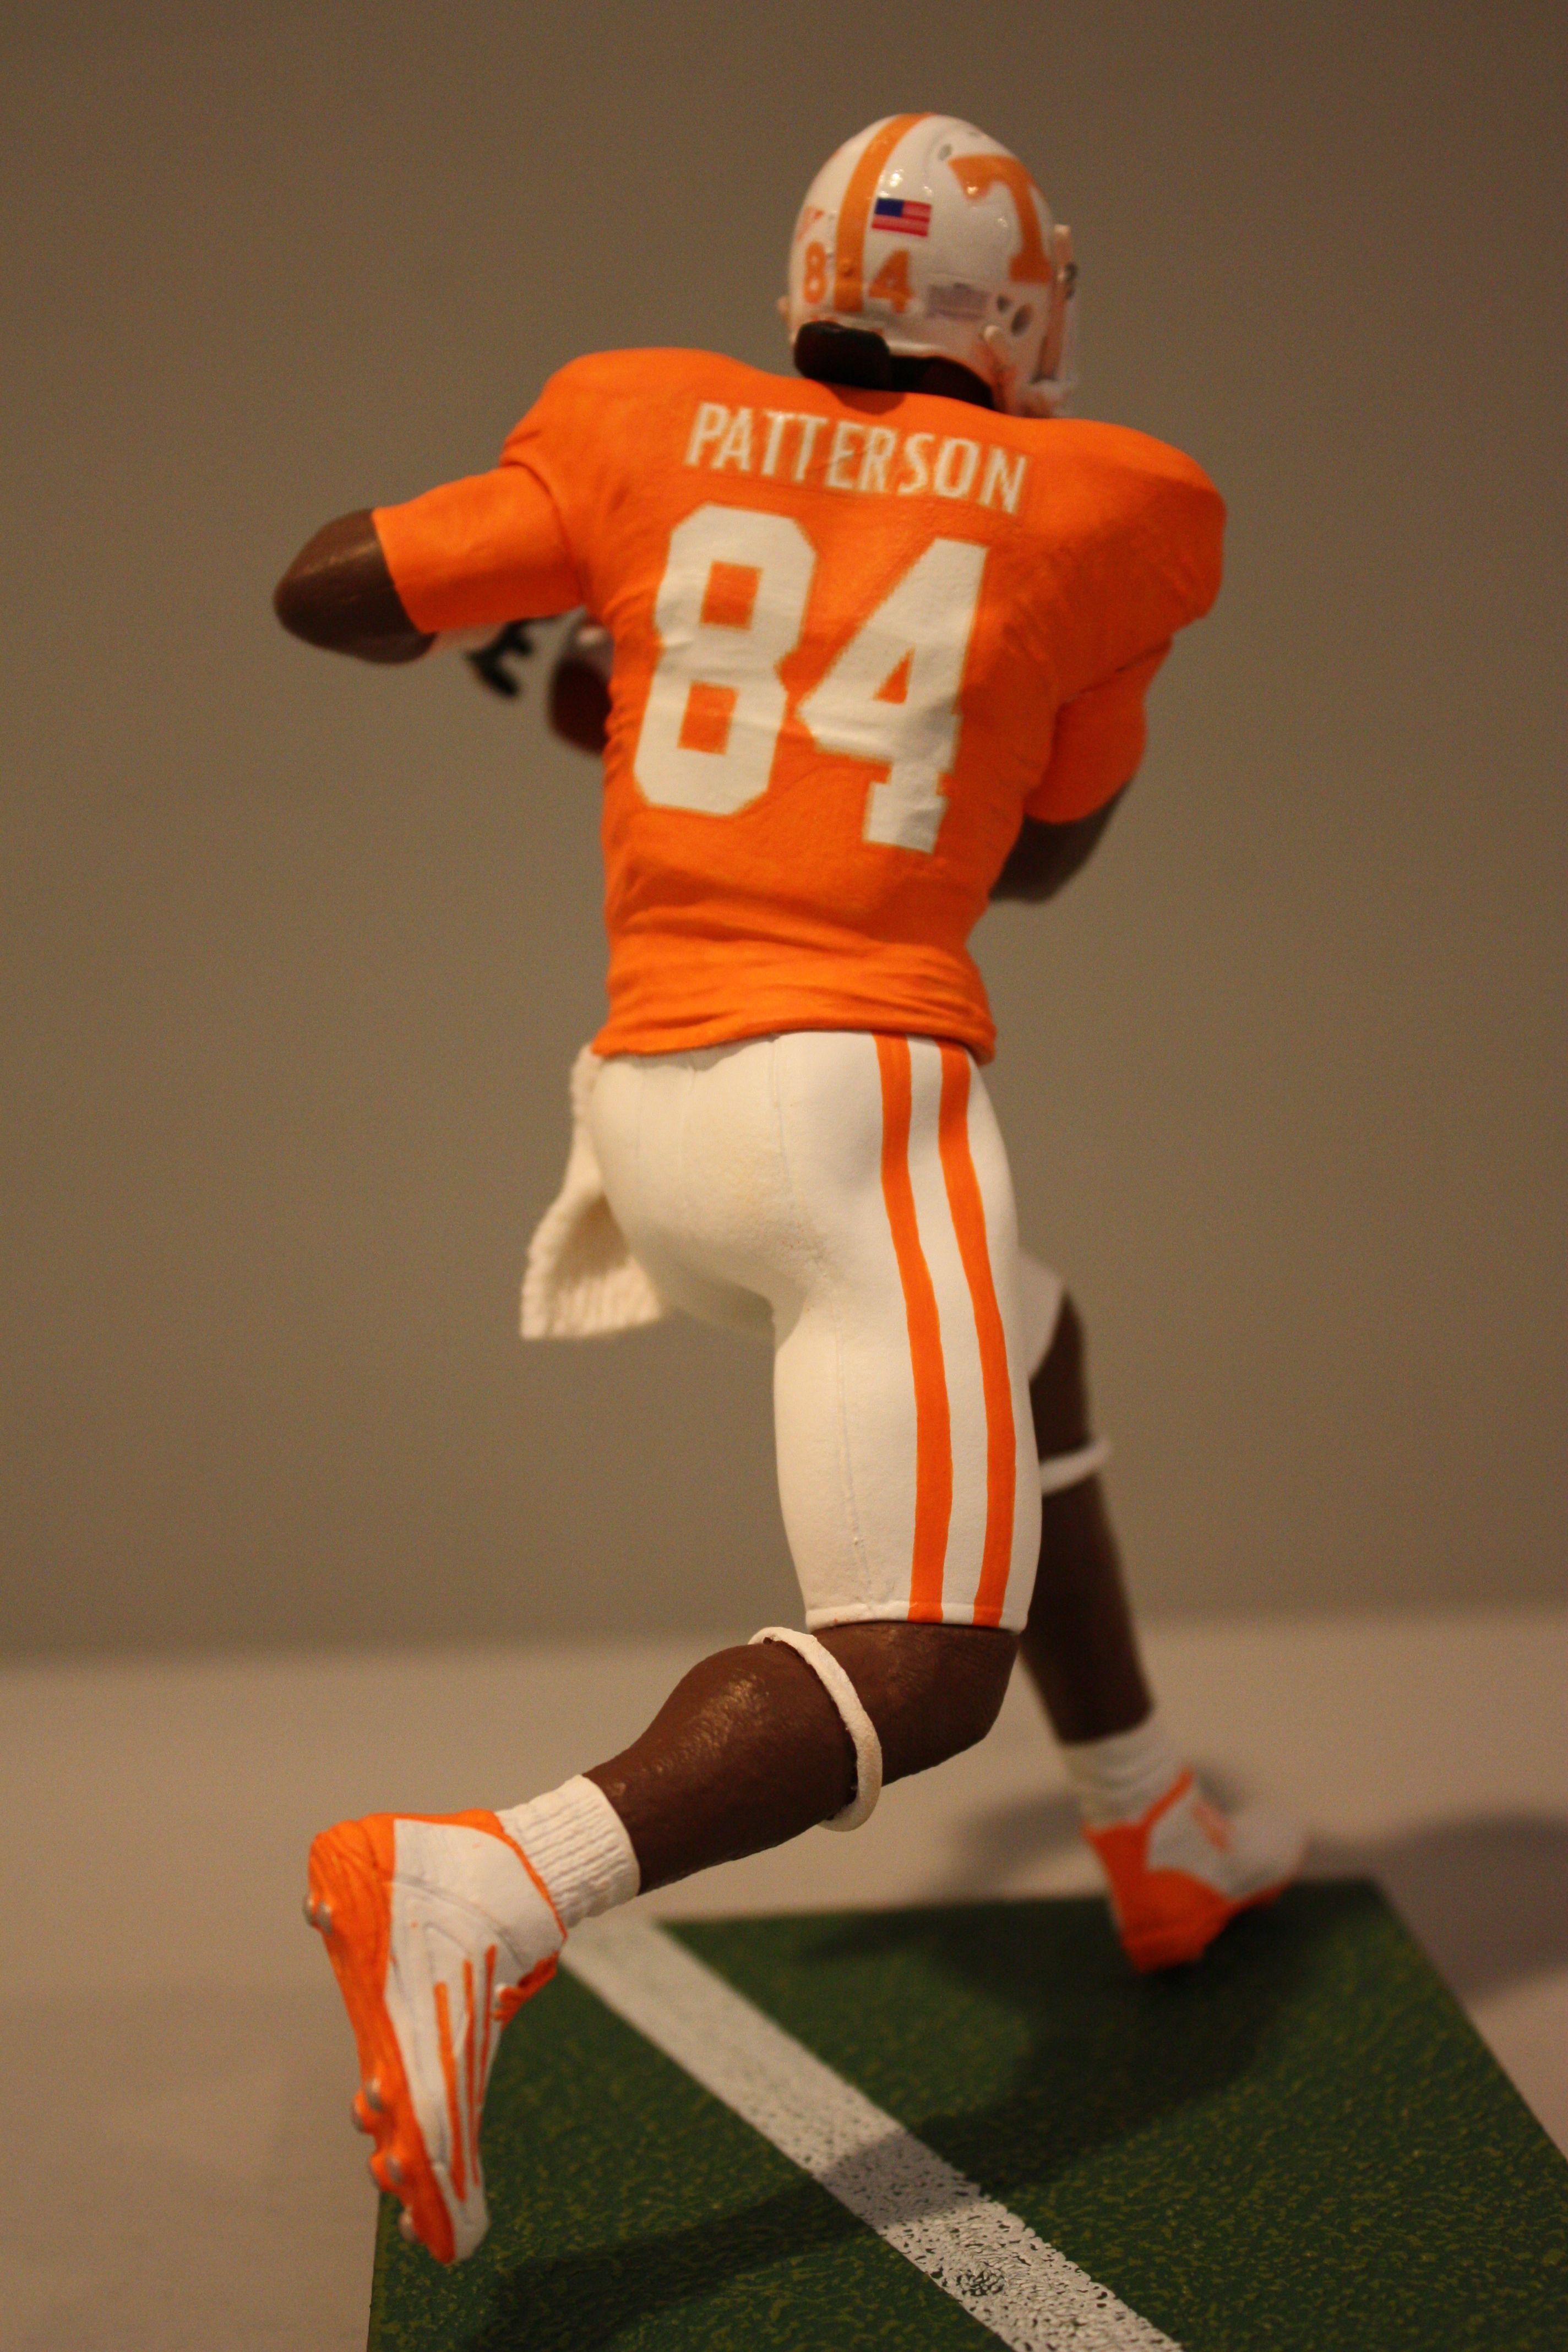 Tennessee Volunteers wide receiver Cordarrelle Patterson ...